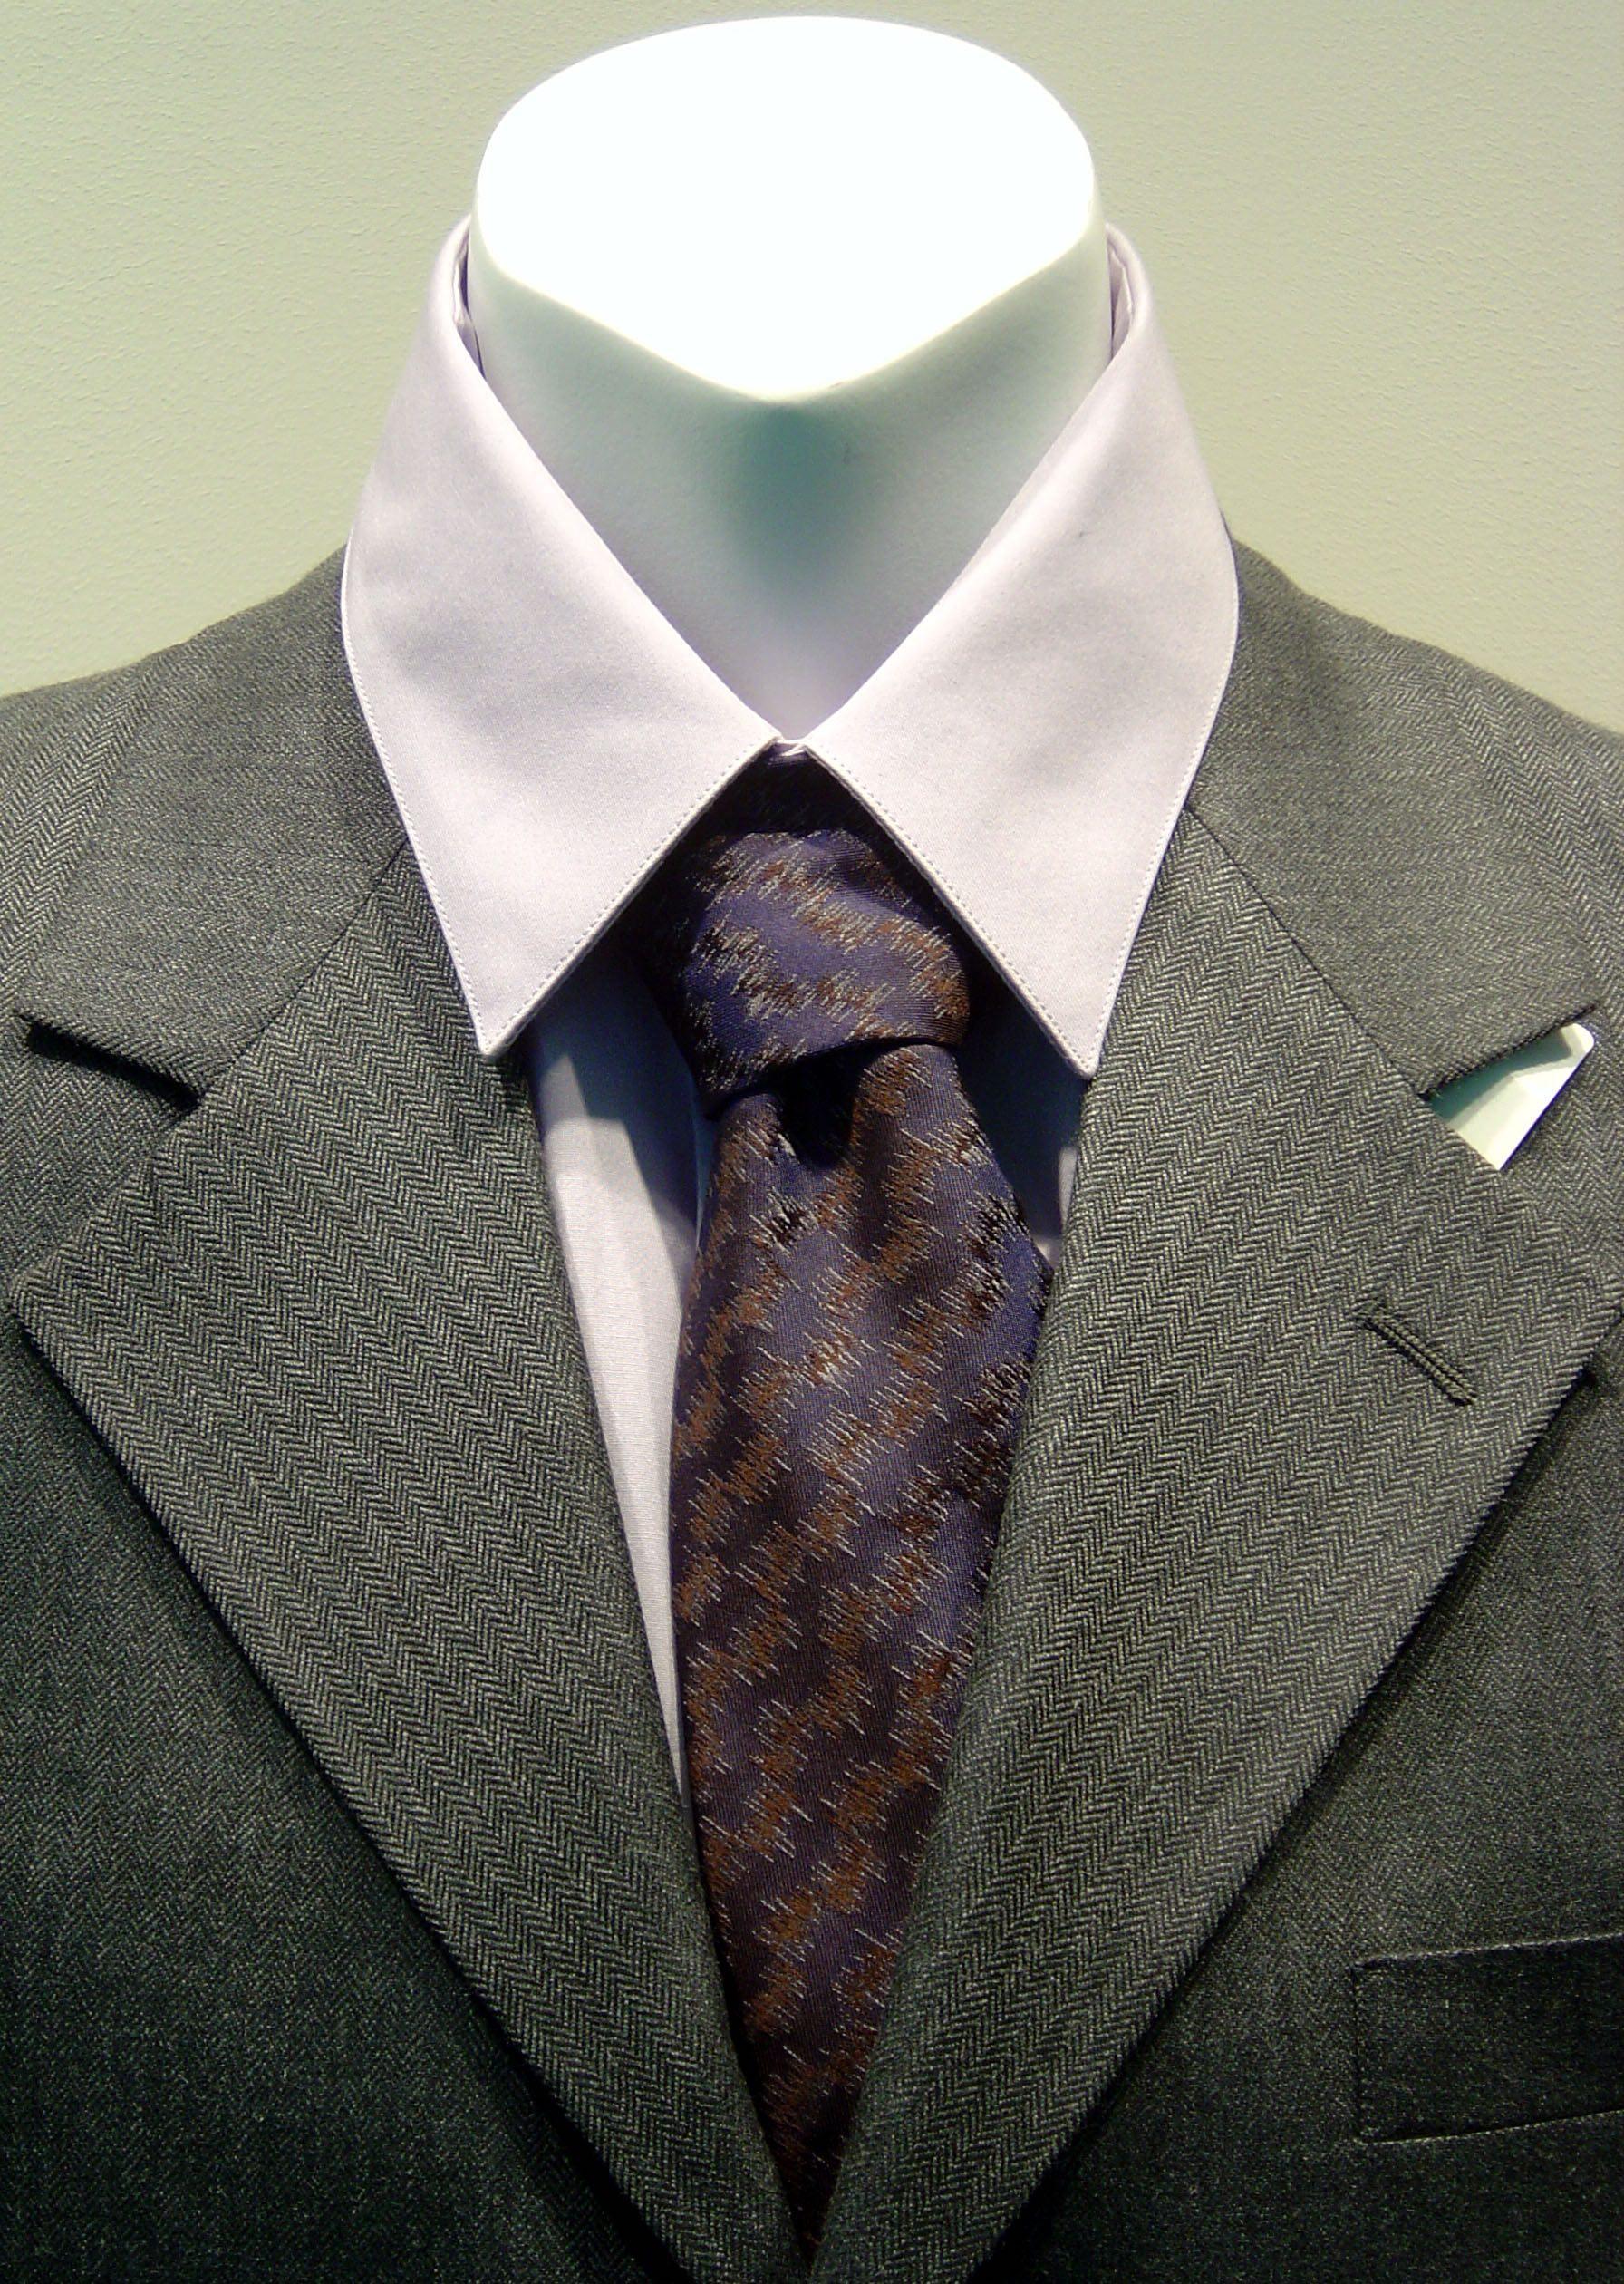 sharp-dressed-breast-1241310